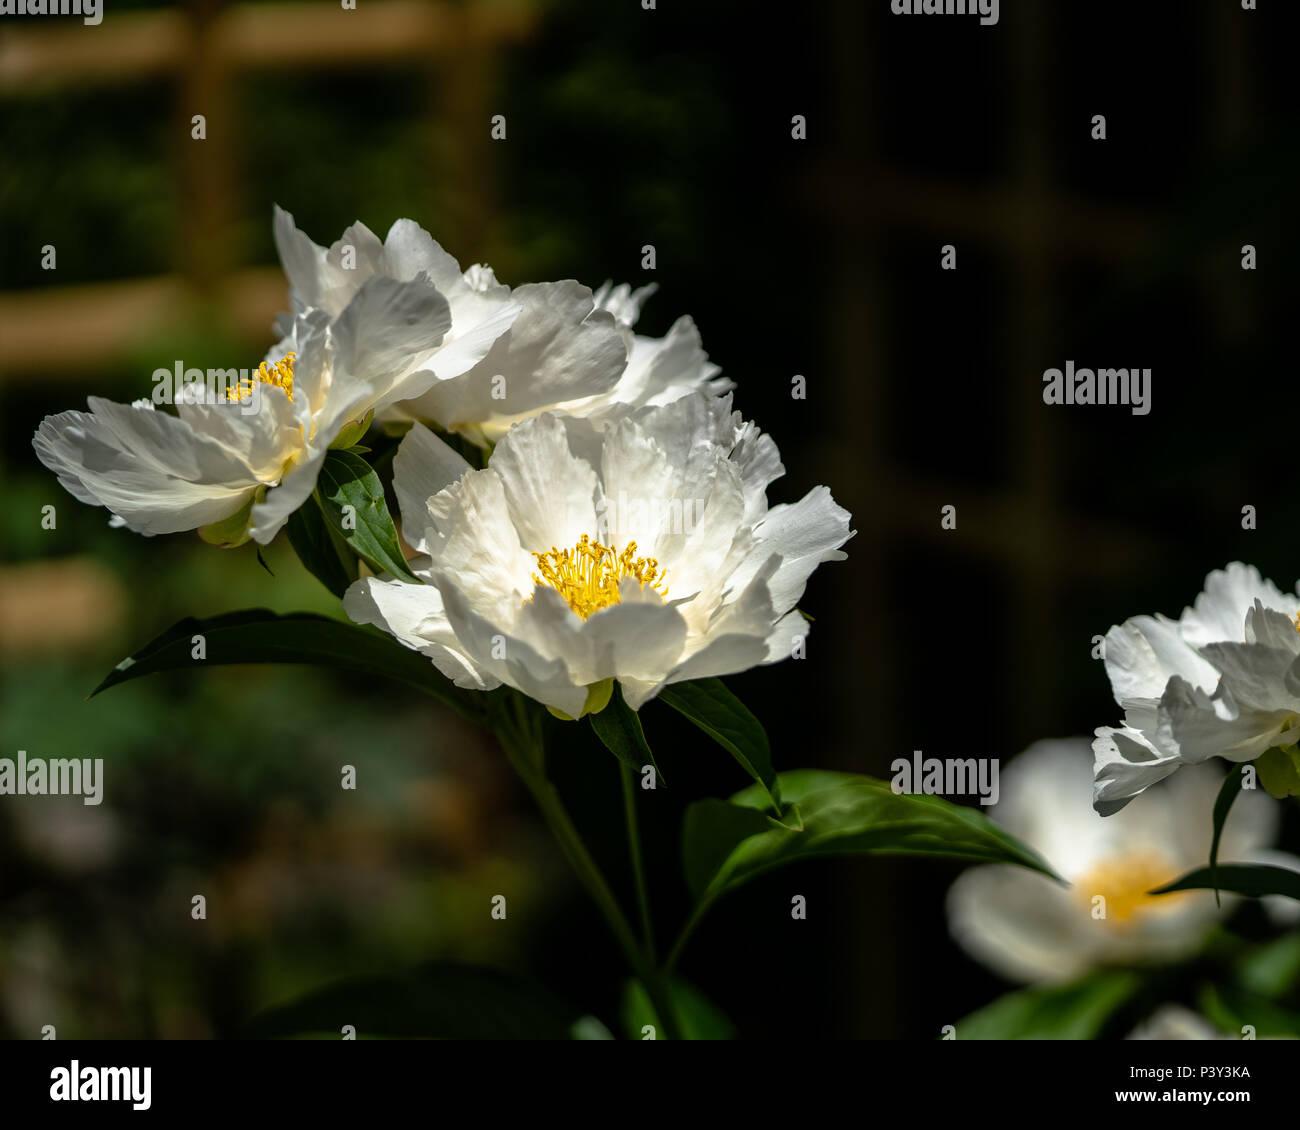 Beautiful white flower  - Stock Image